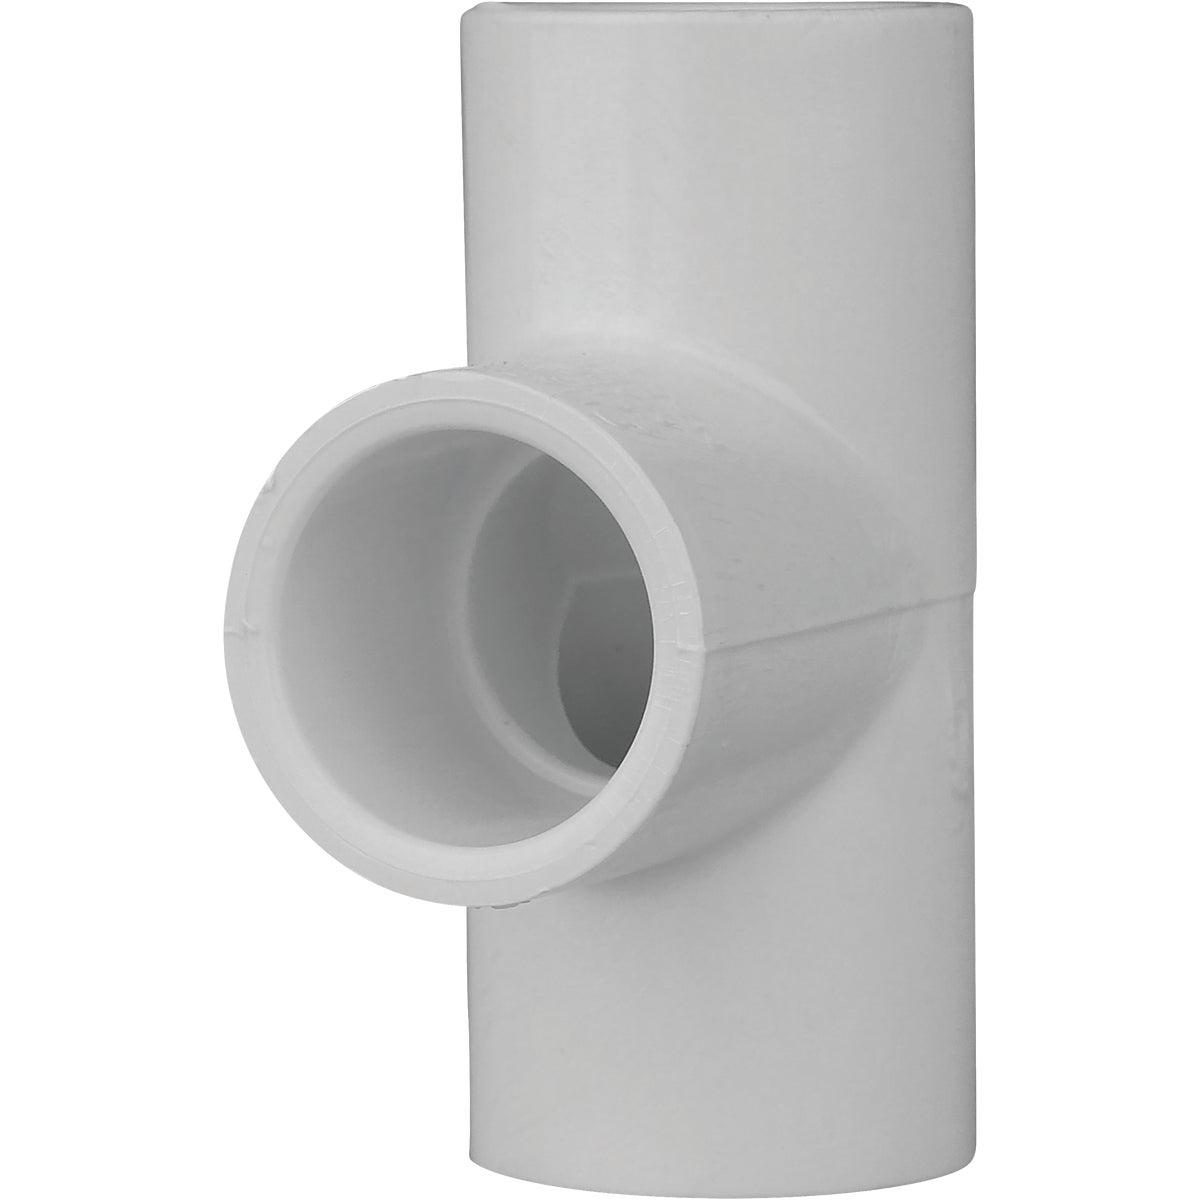 "10PK 1/2"" SCH40 PVC TEE - 31405CP by Genova Inc"